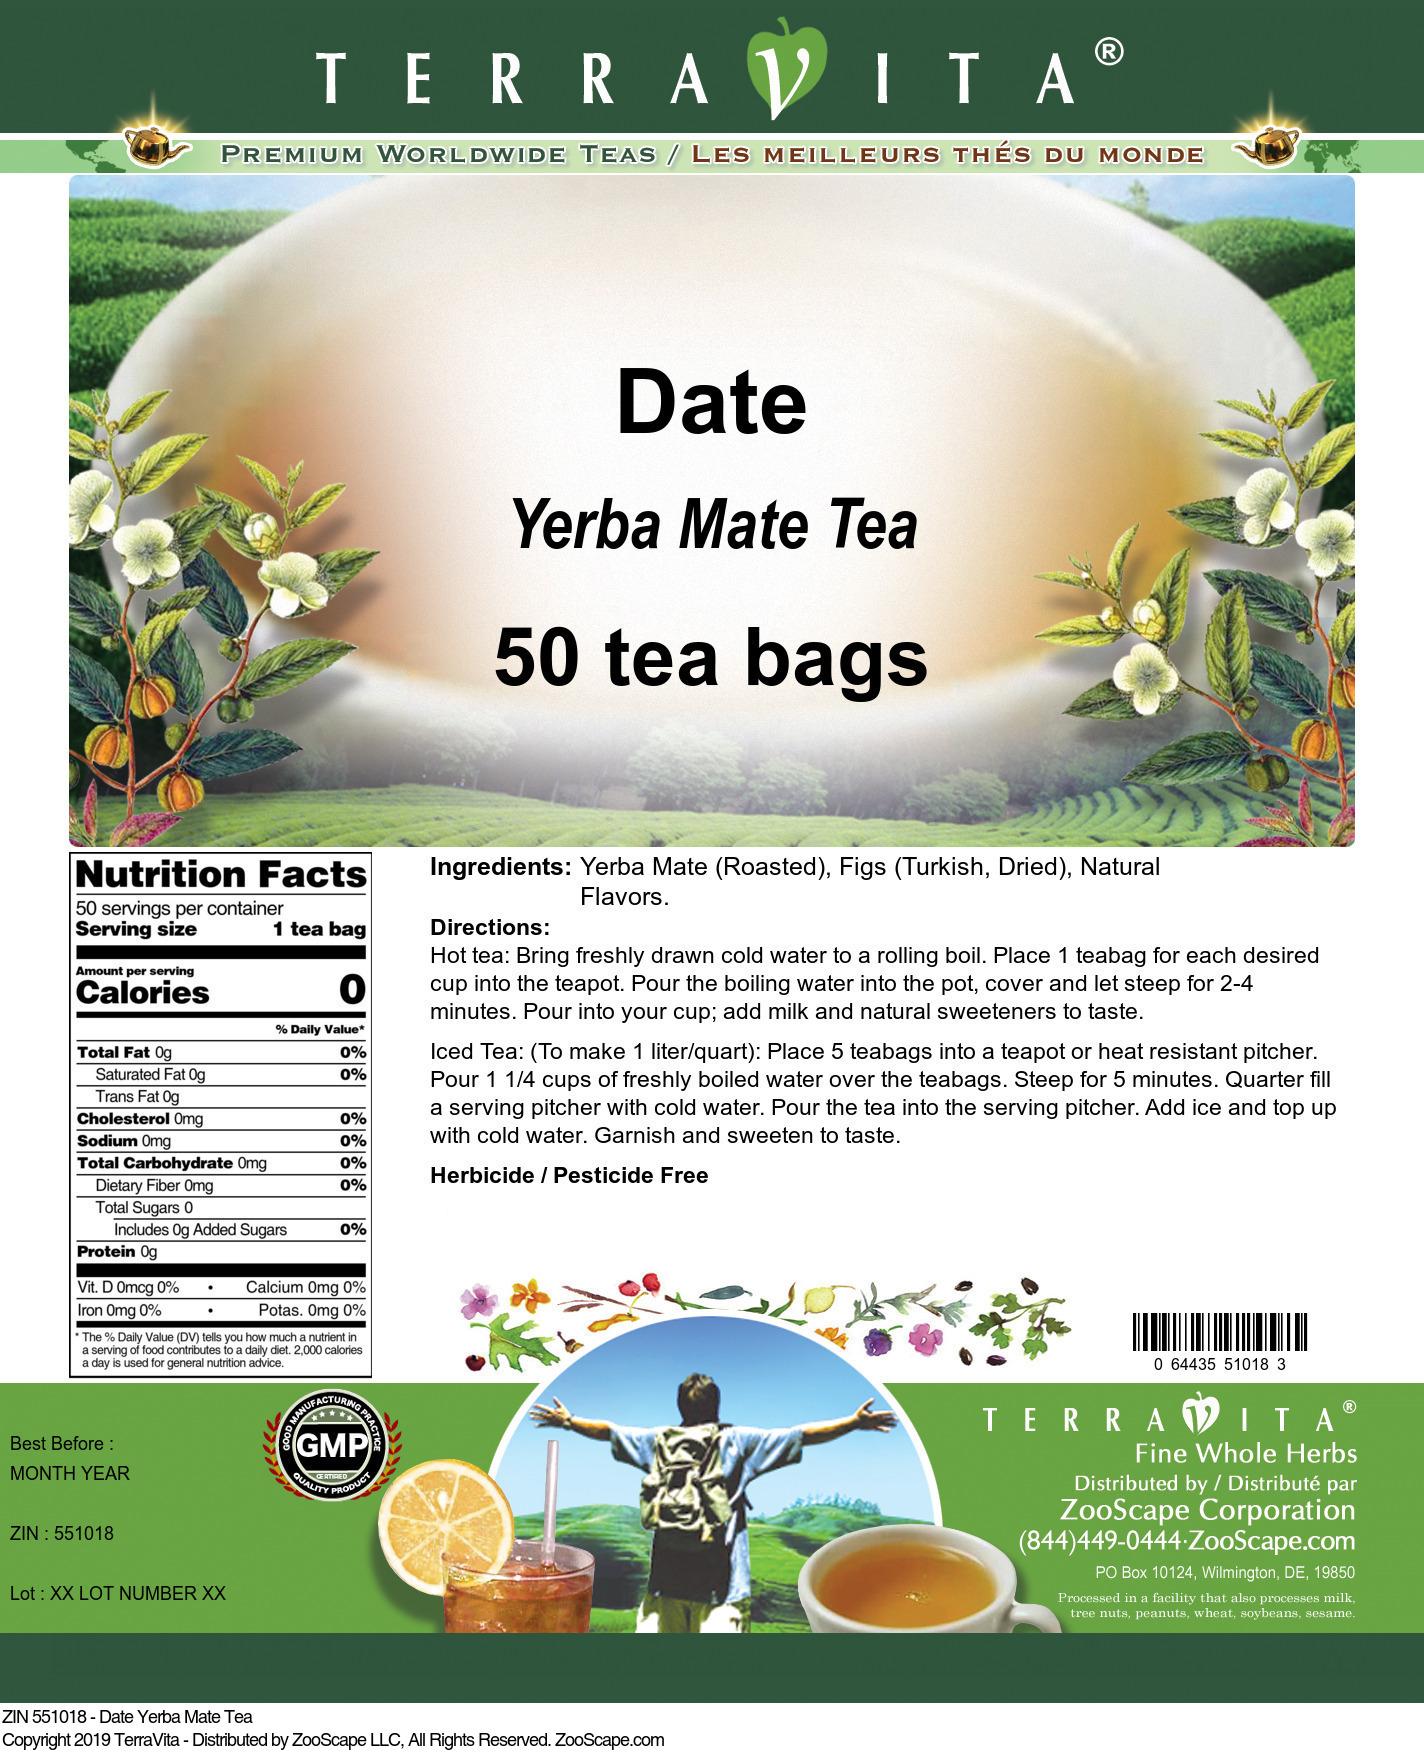 Date Yerba Mate Tea